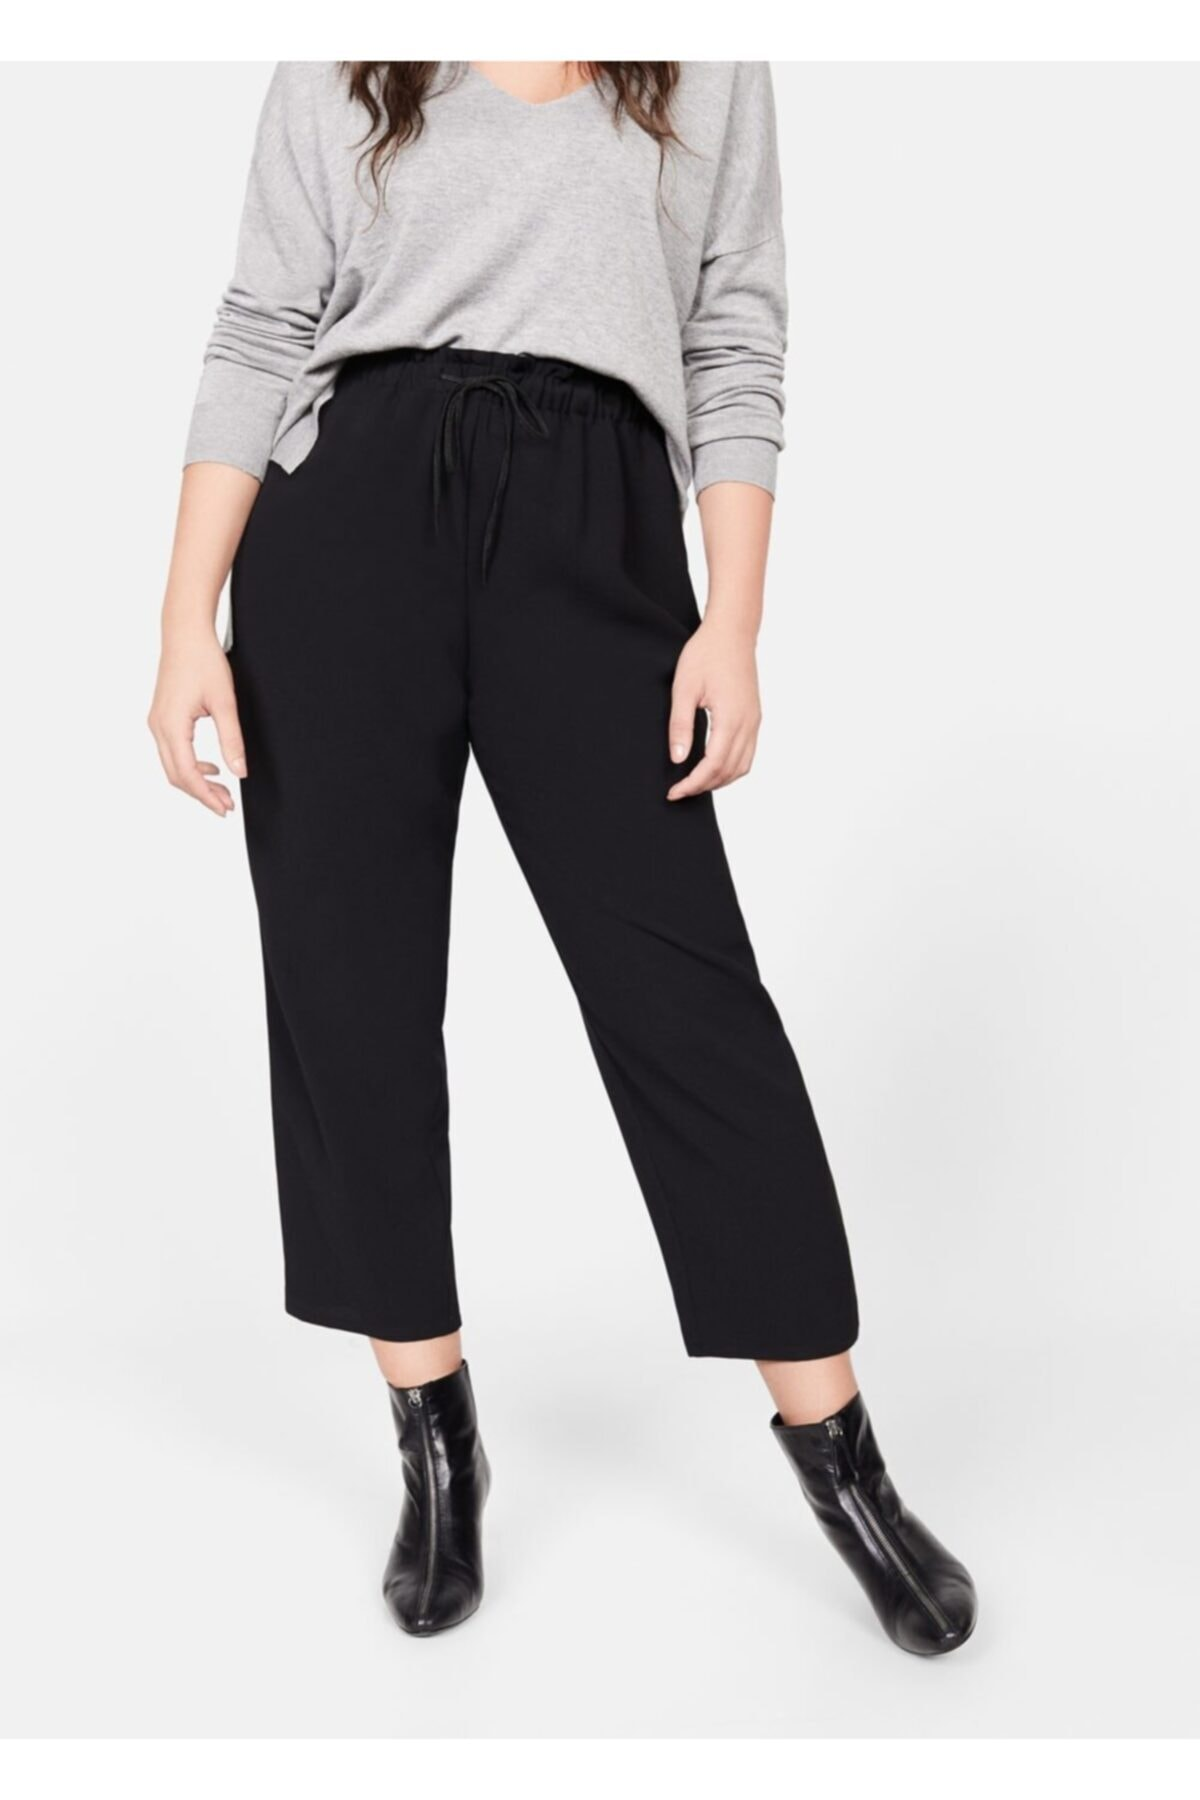 Violeta by MANGO Kadın Siyah Beli Elastik Pantolon 61110630 2